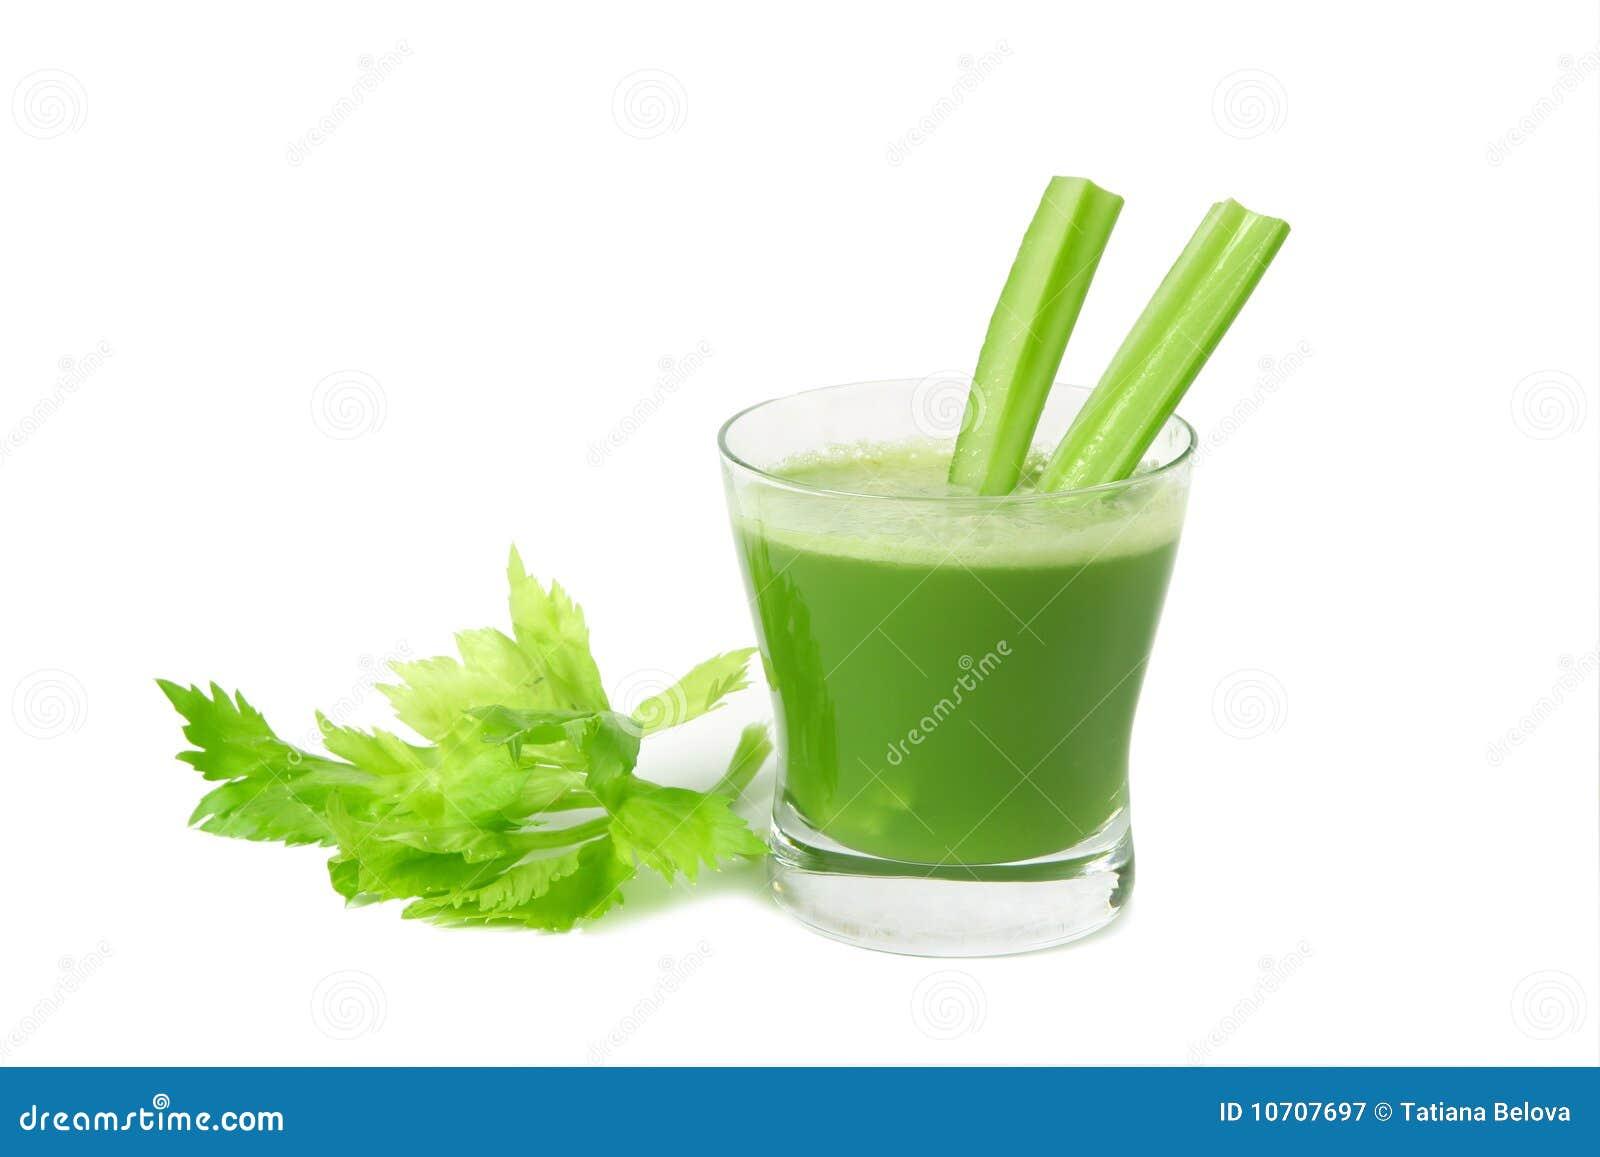 Selerowy sok